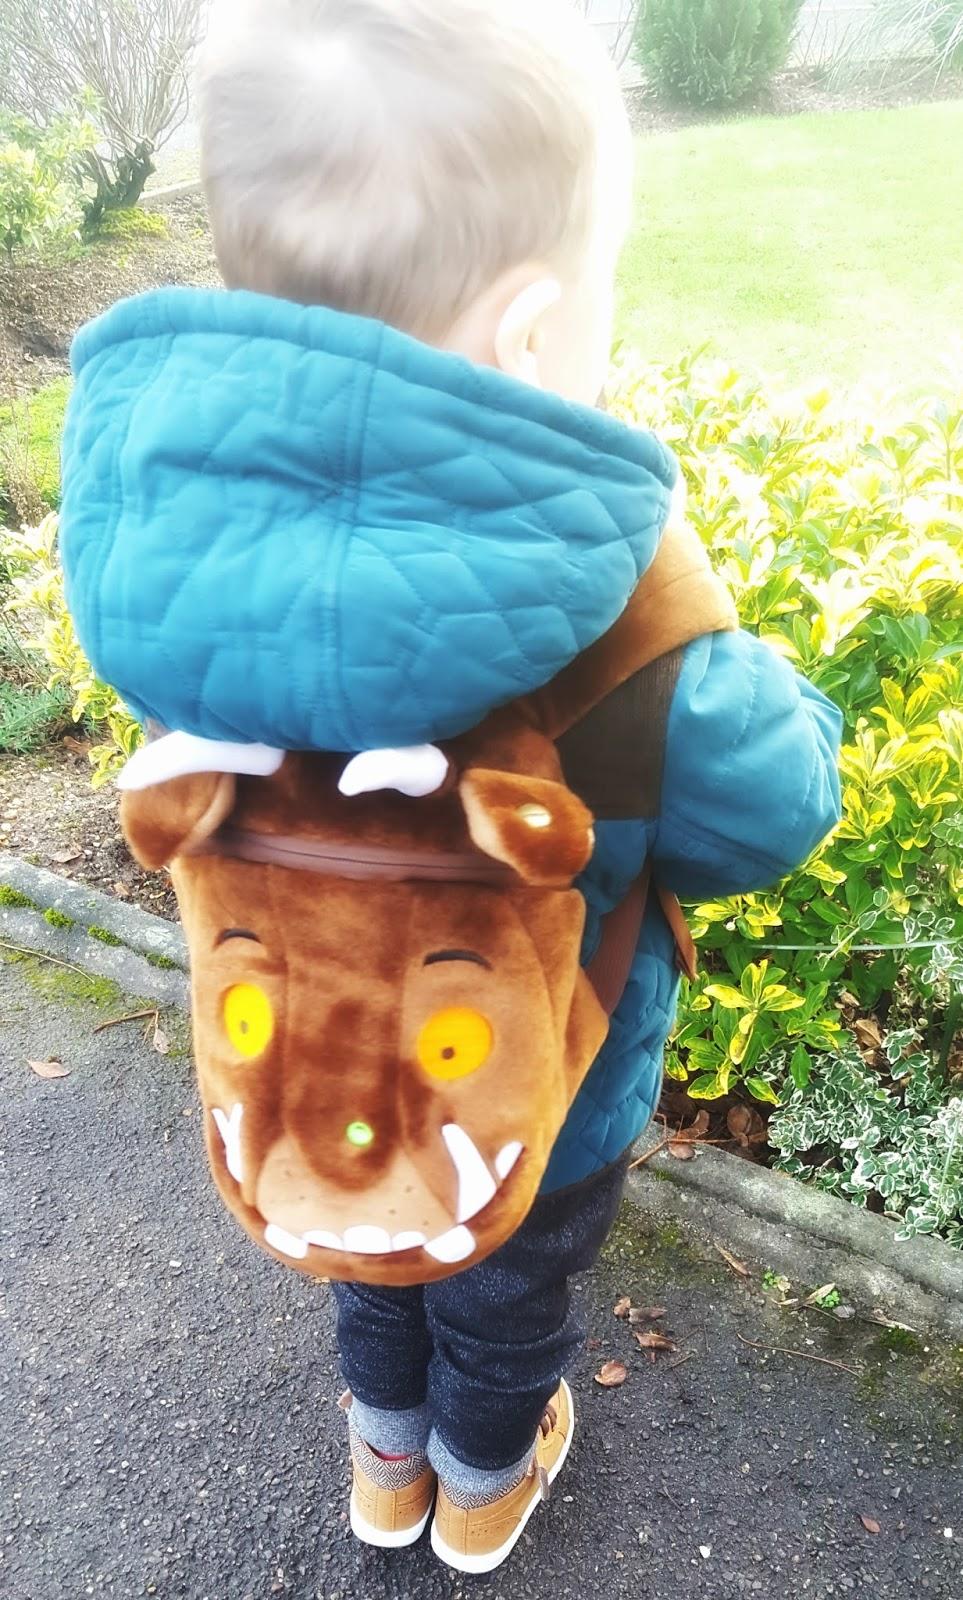 ee5025e5b71 Gruffalo Kids Backpack Review